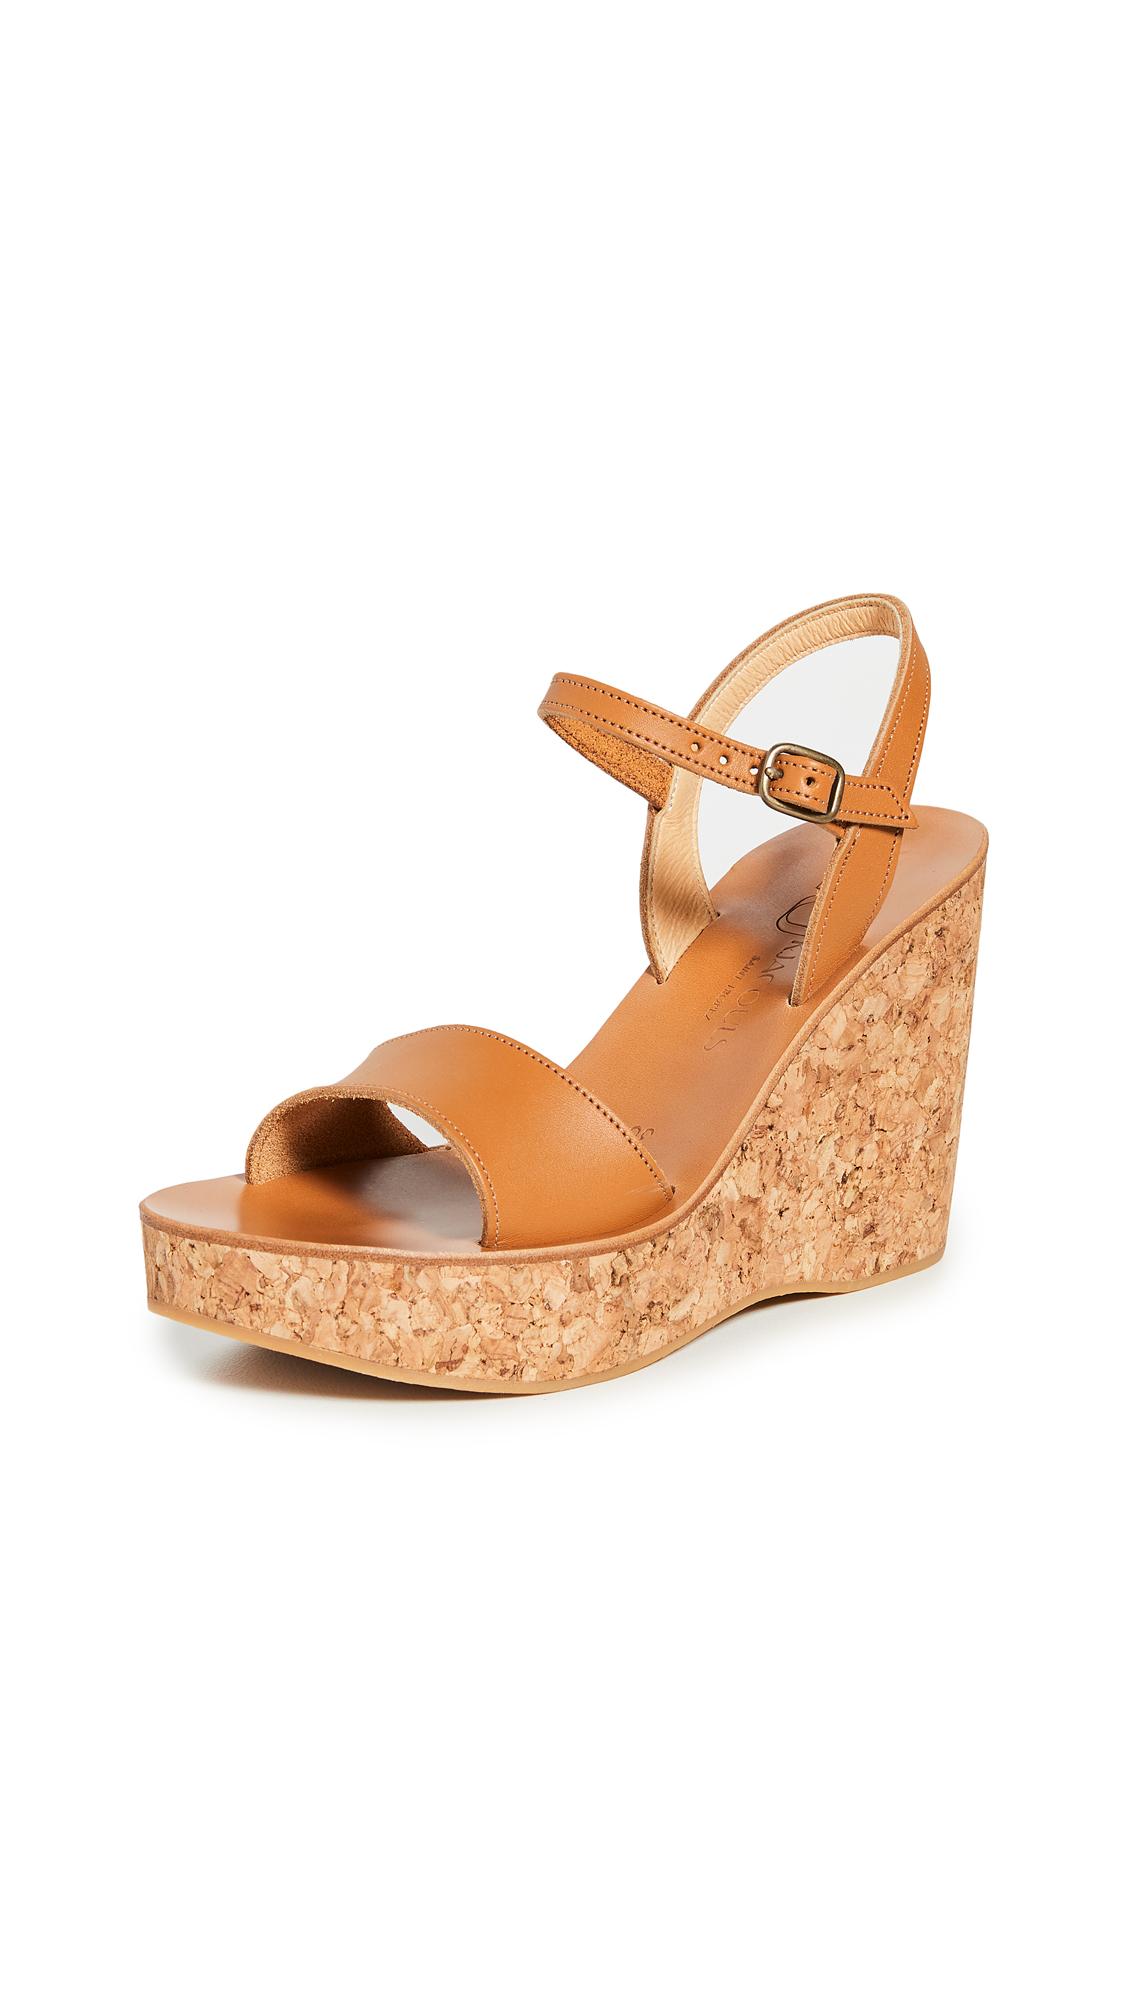 Buy K. Jacques Sharon Wedge Sandals online, shop K. Jacques